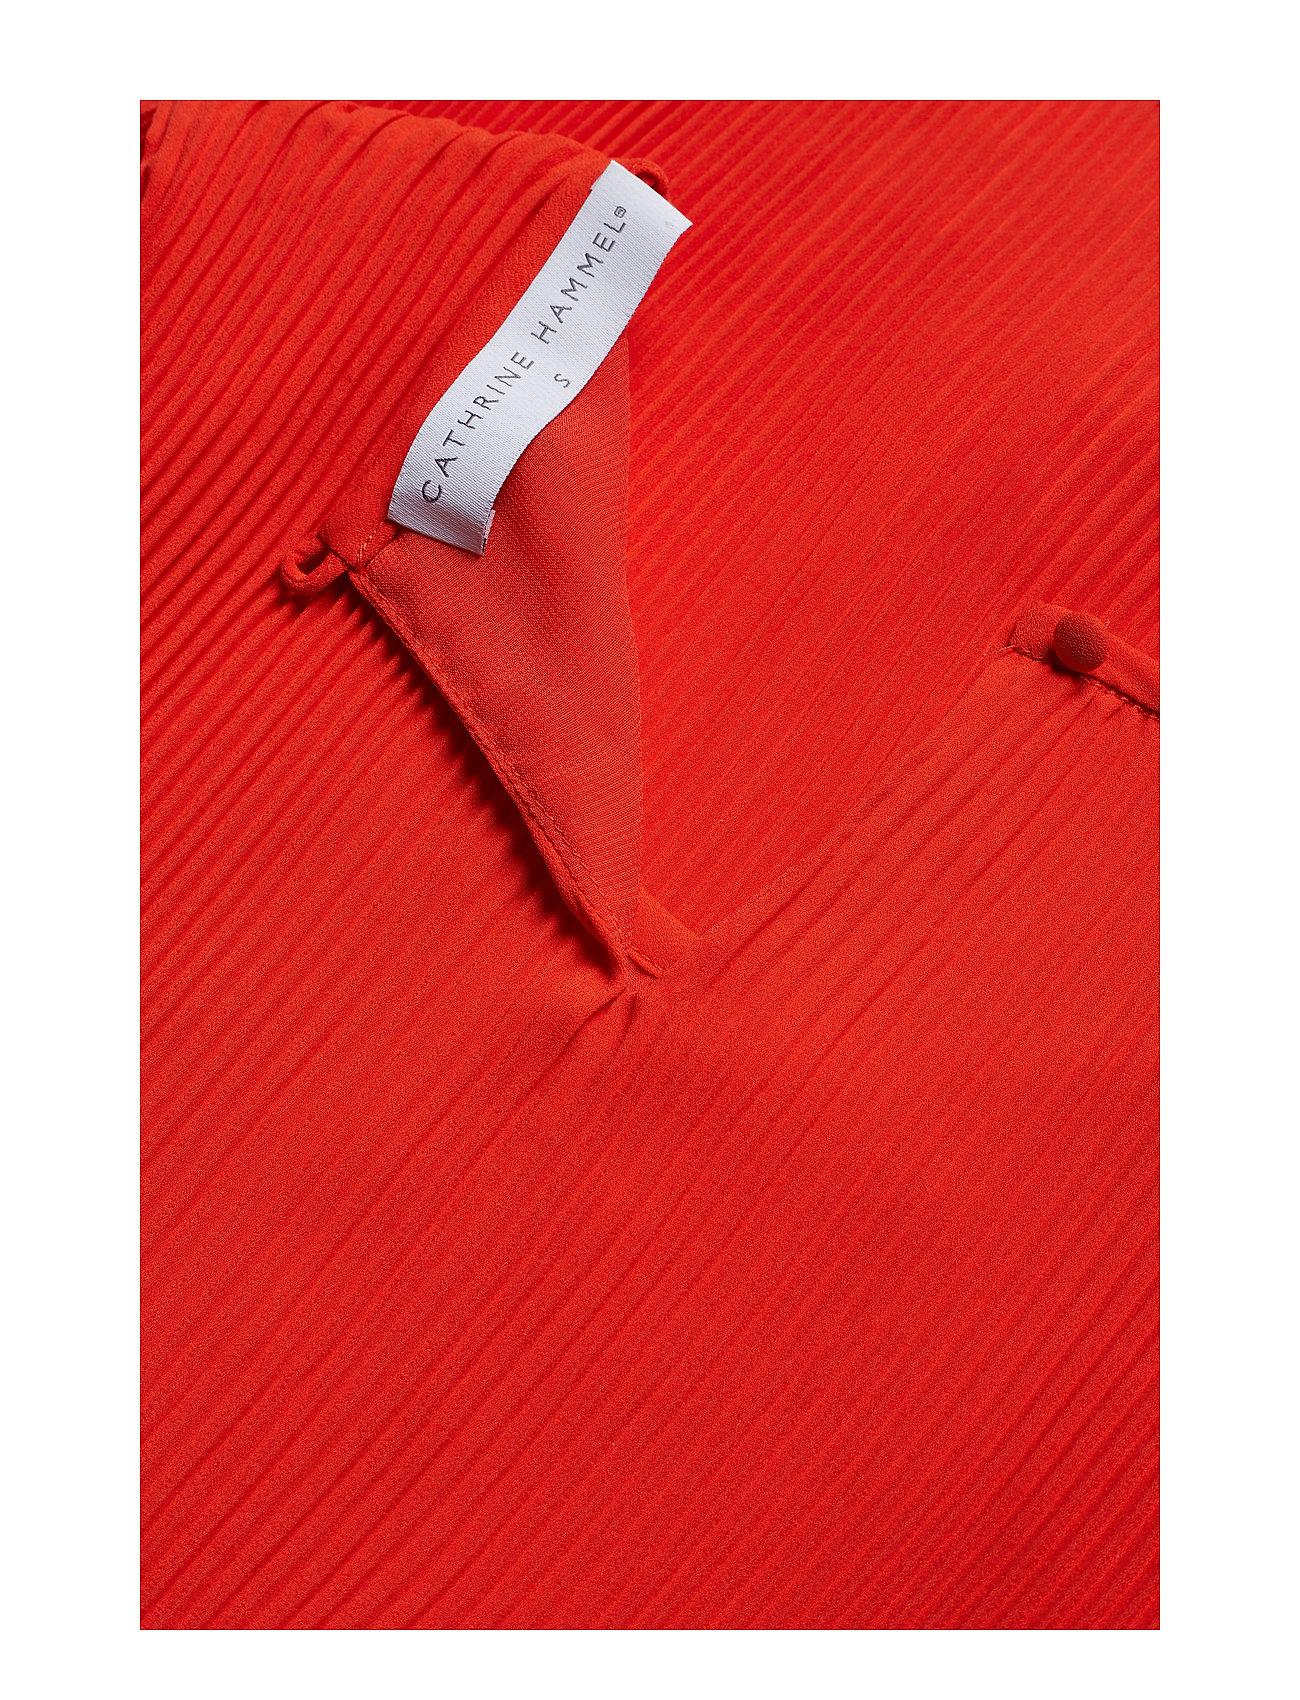 Miami Tee-shirt  - Cathrine Hammel